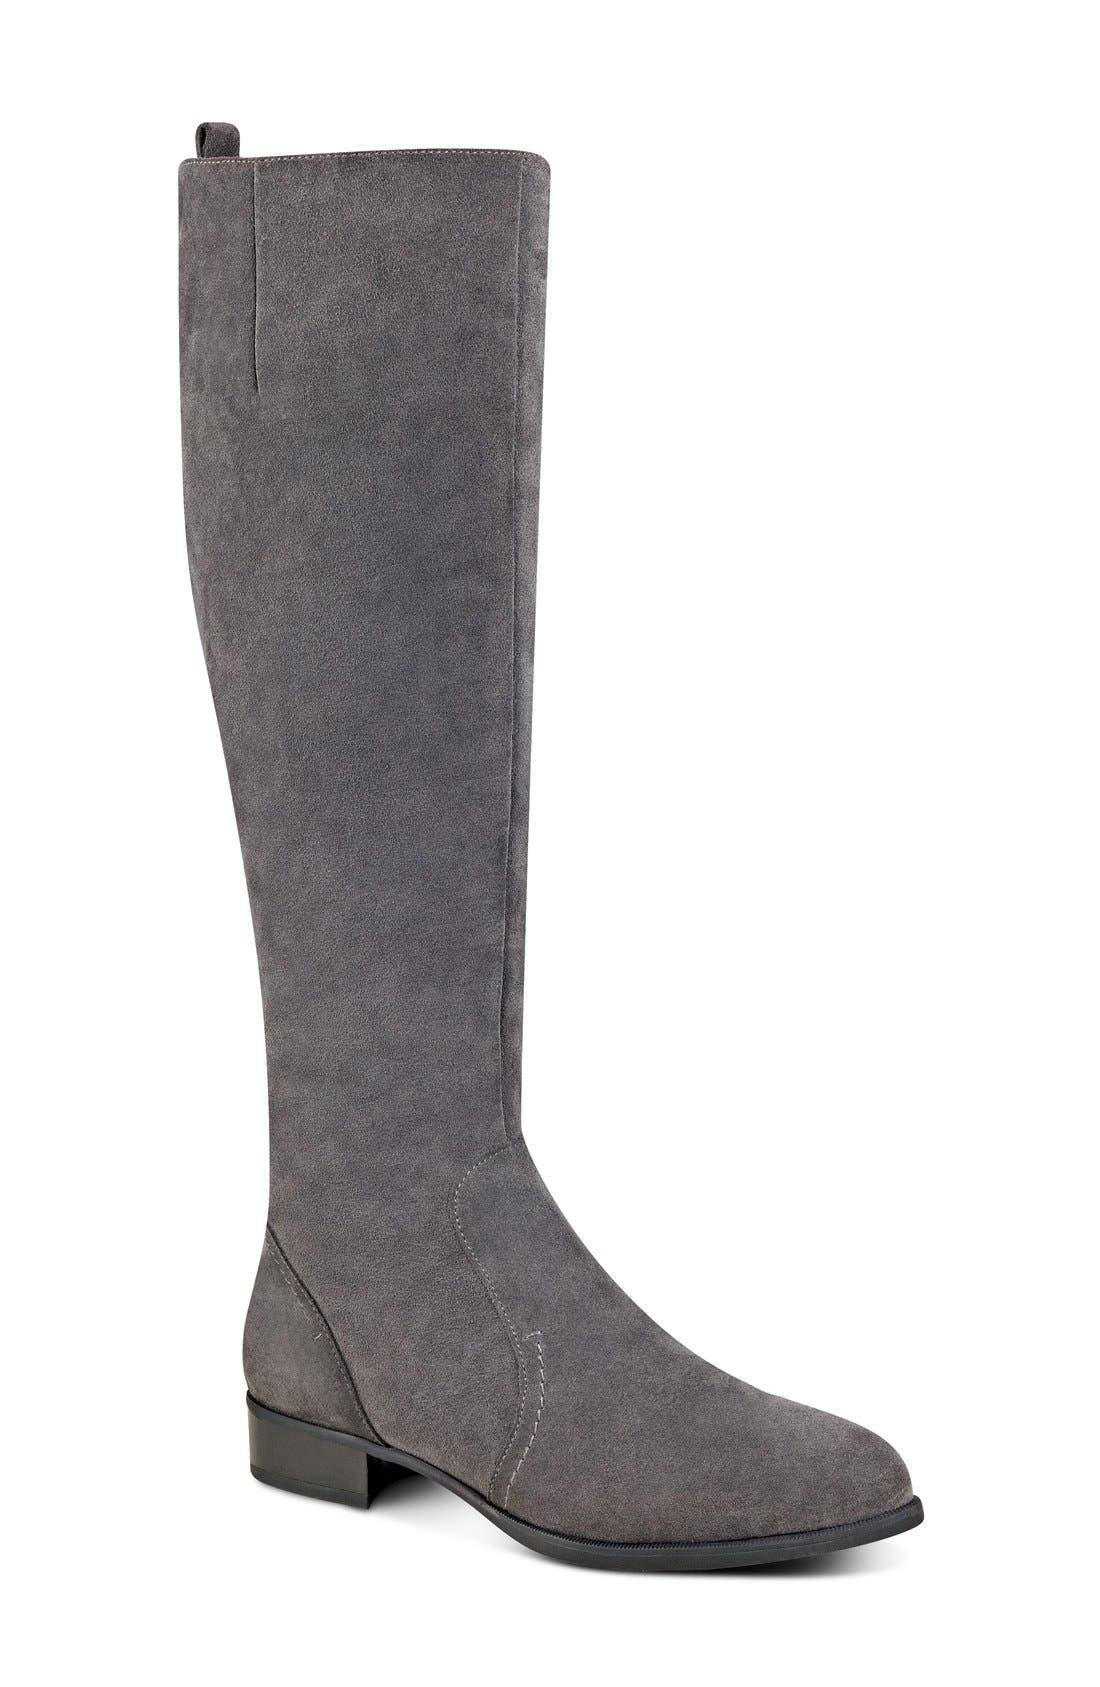 Main Image - Nine West 'Nicolah' Tall Boot (Women)